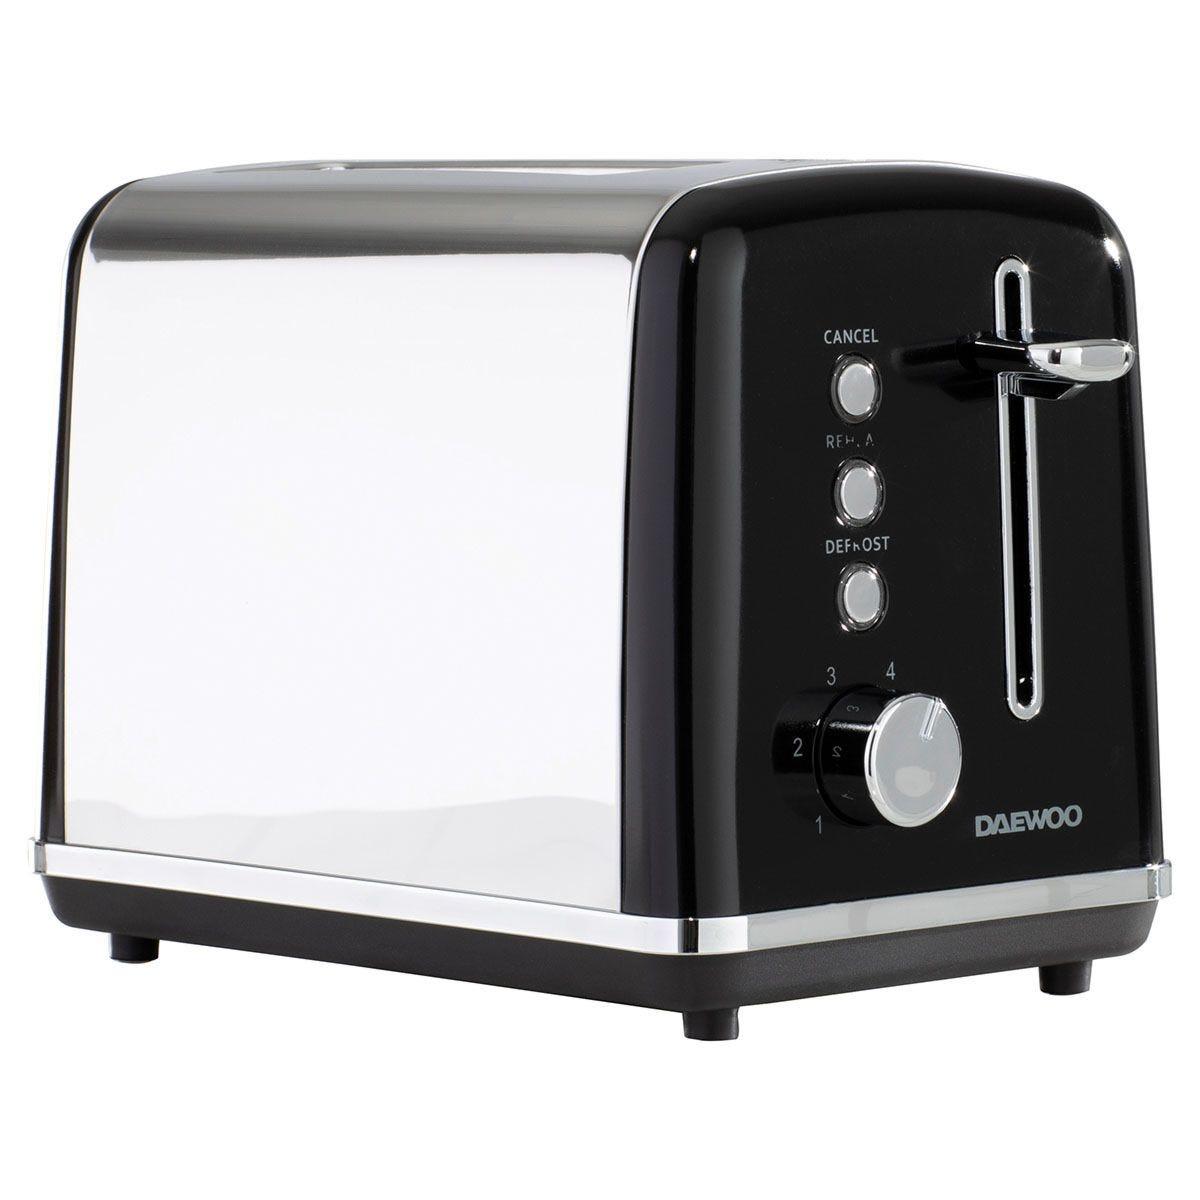 Daewoo SDA1583 Kensington 2–Slice Toaster with 6 Settings – Black